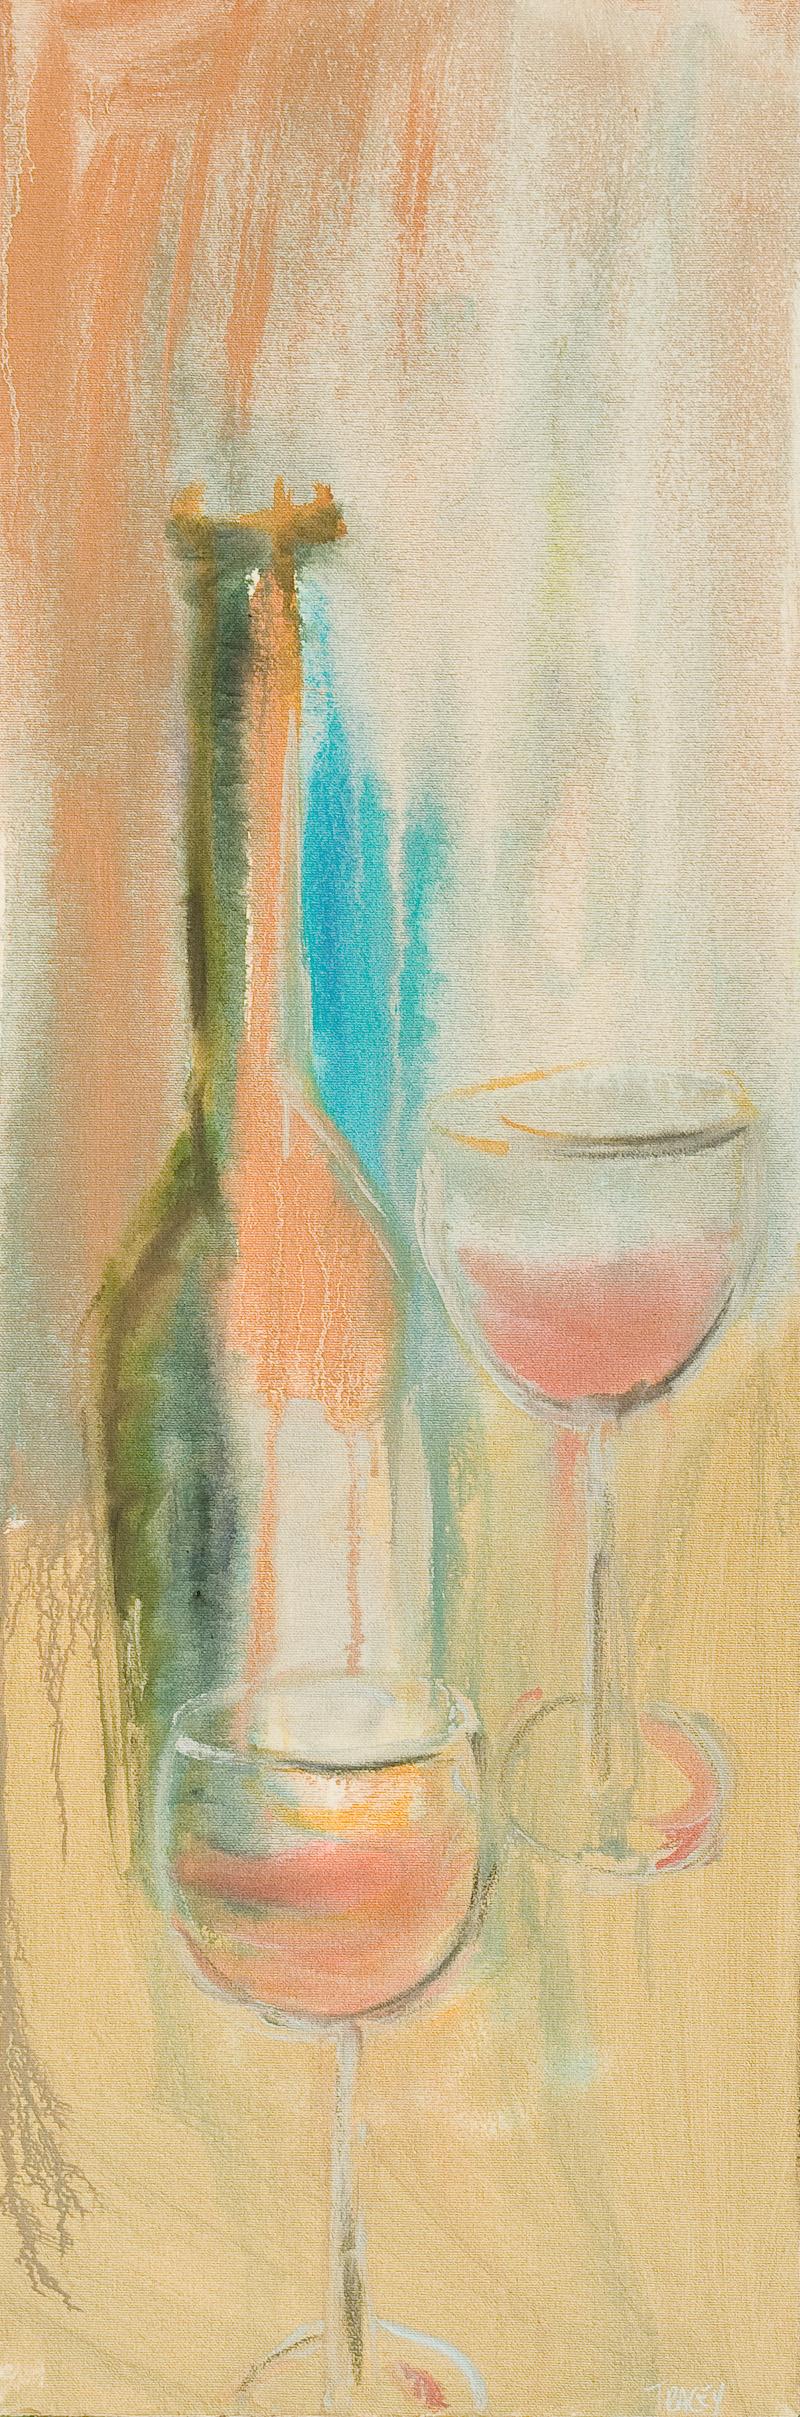 tracey-j-marshall-wine-food-washes-473.jpg